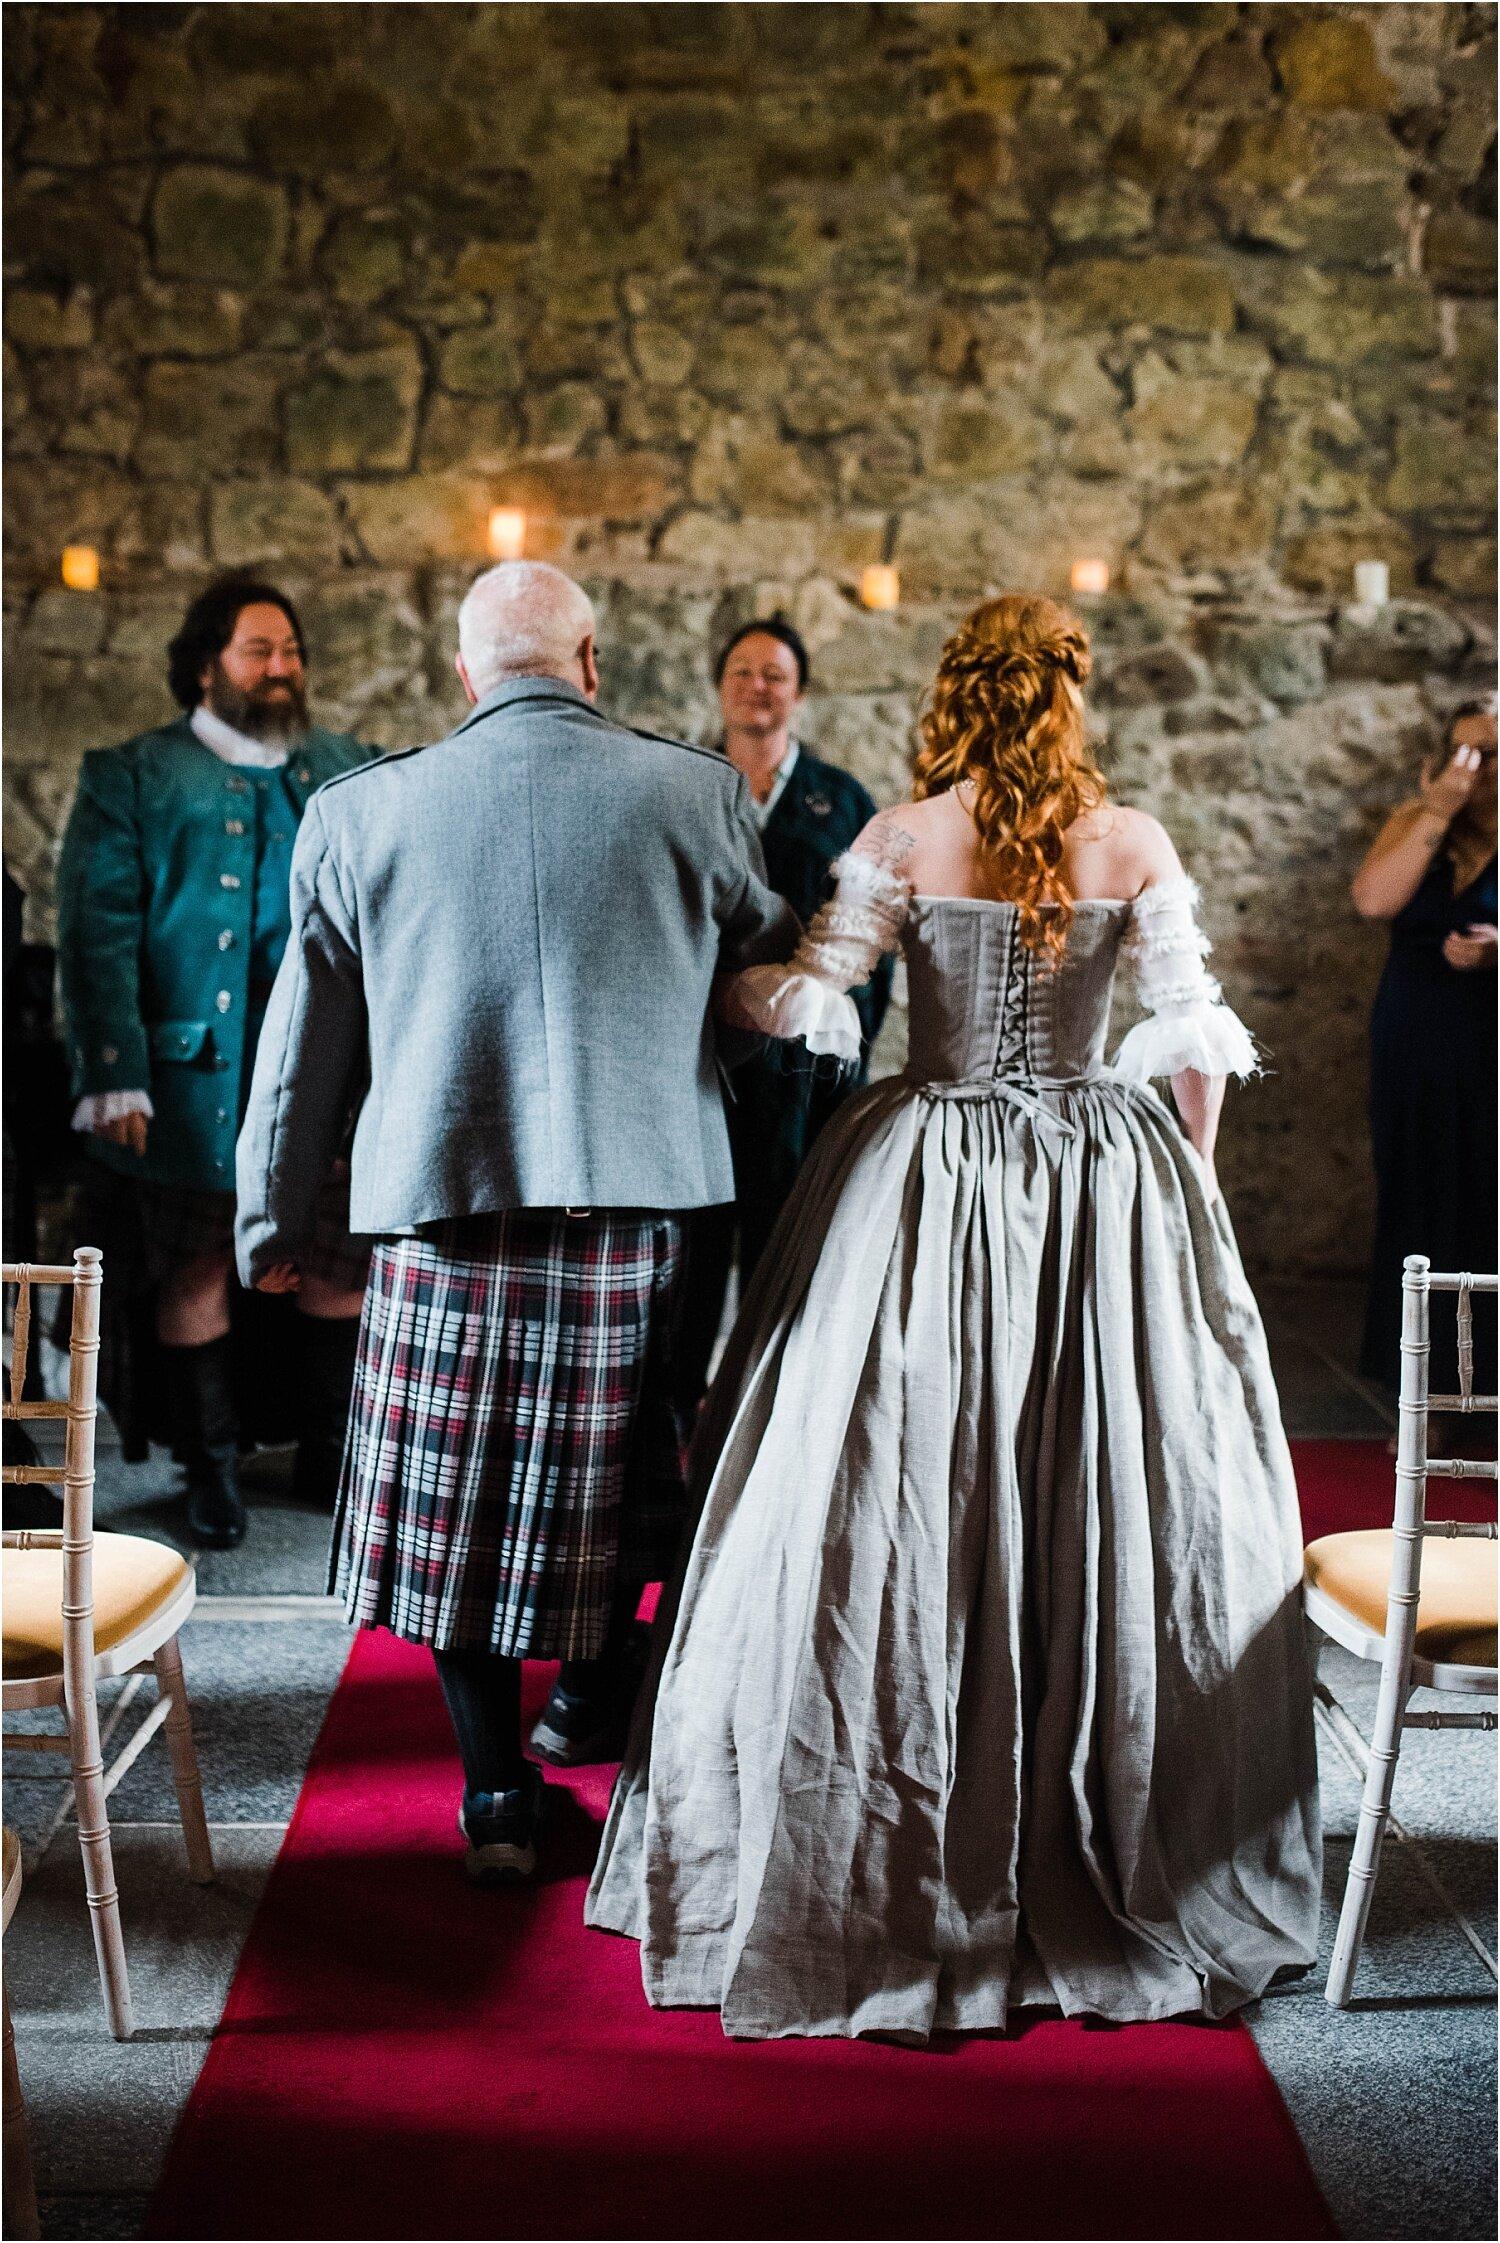 Wolf + Lea-Outlander-Inspired-Elopement-Wedding-Scotland_Gabby Chapin Photography_039.jpg